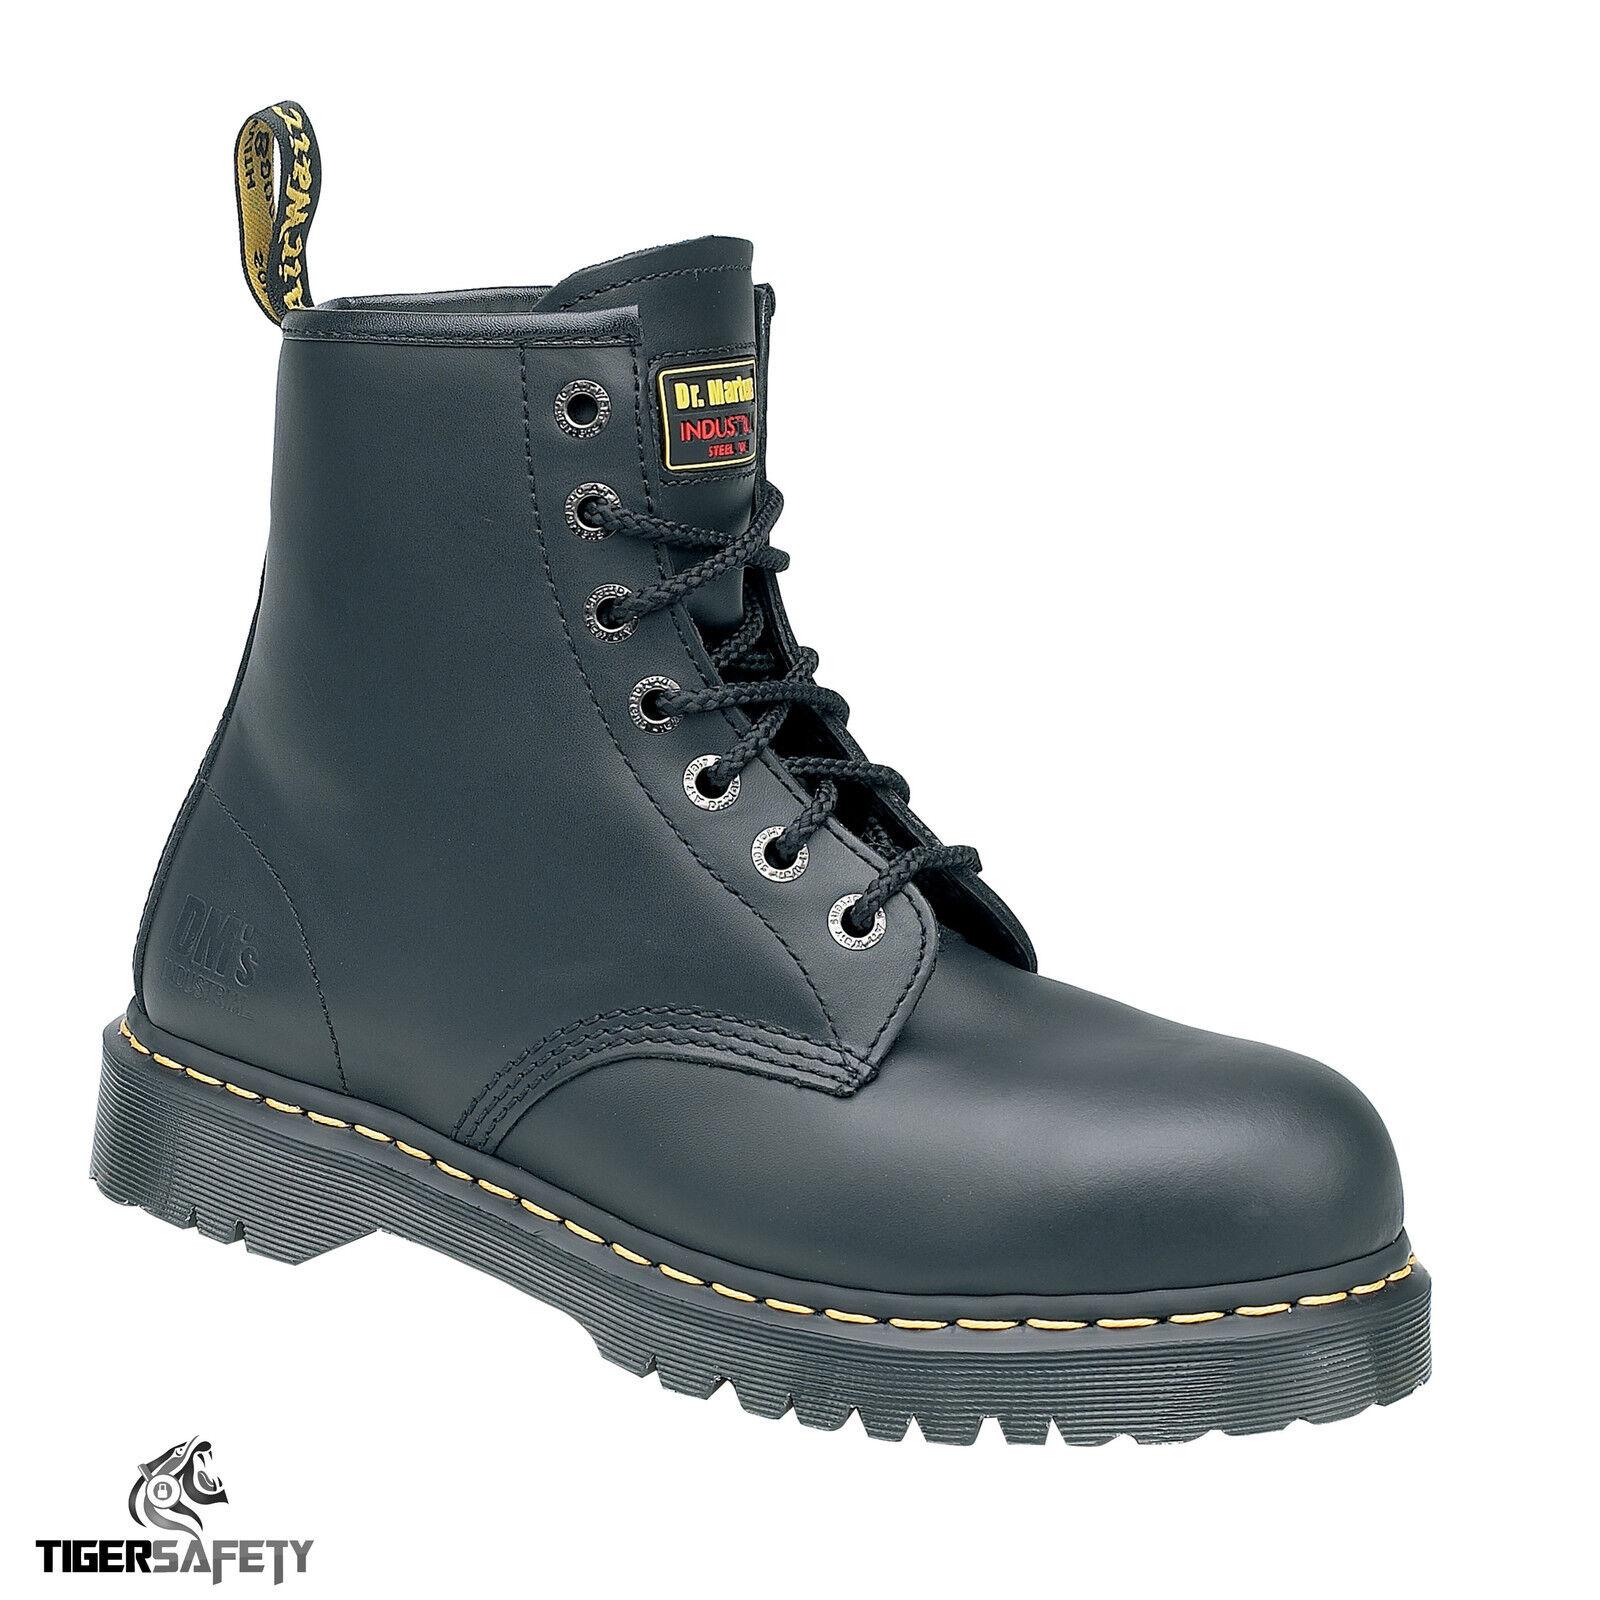 Dr Martens DM Docs Icon 7B10 Steel Toe Cap 7 Eyelet Heavy Duty Work Safety Stiefel